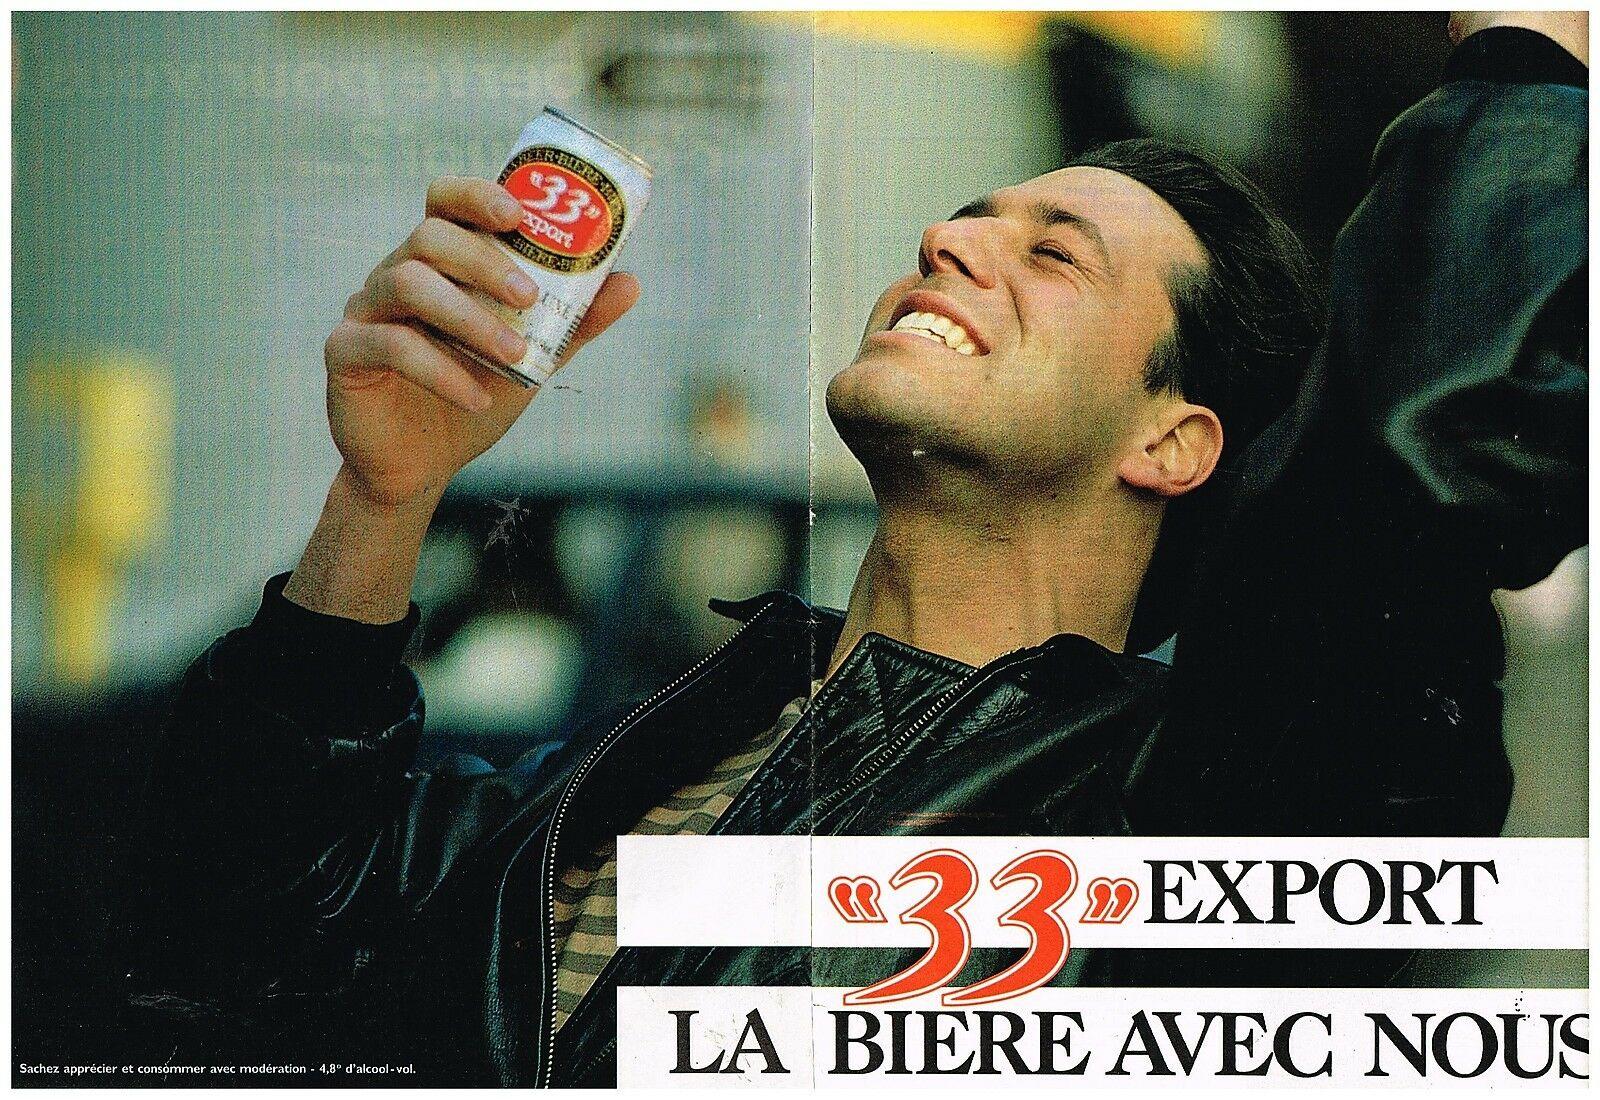 1989 La Biere 33 Export A1